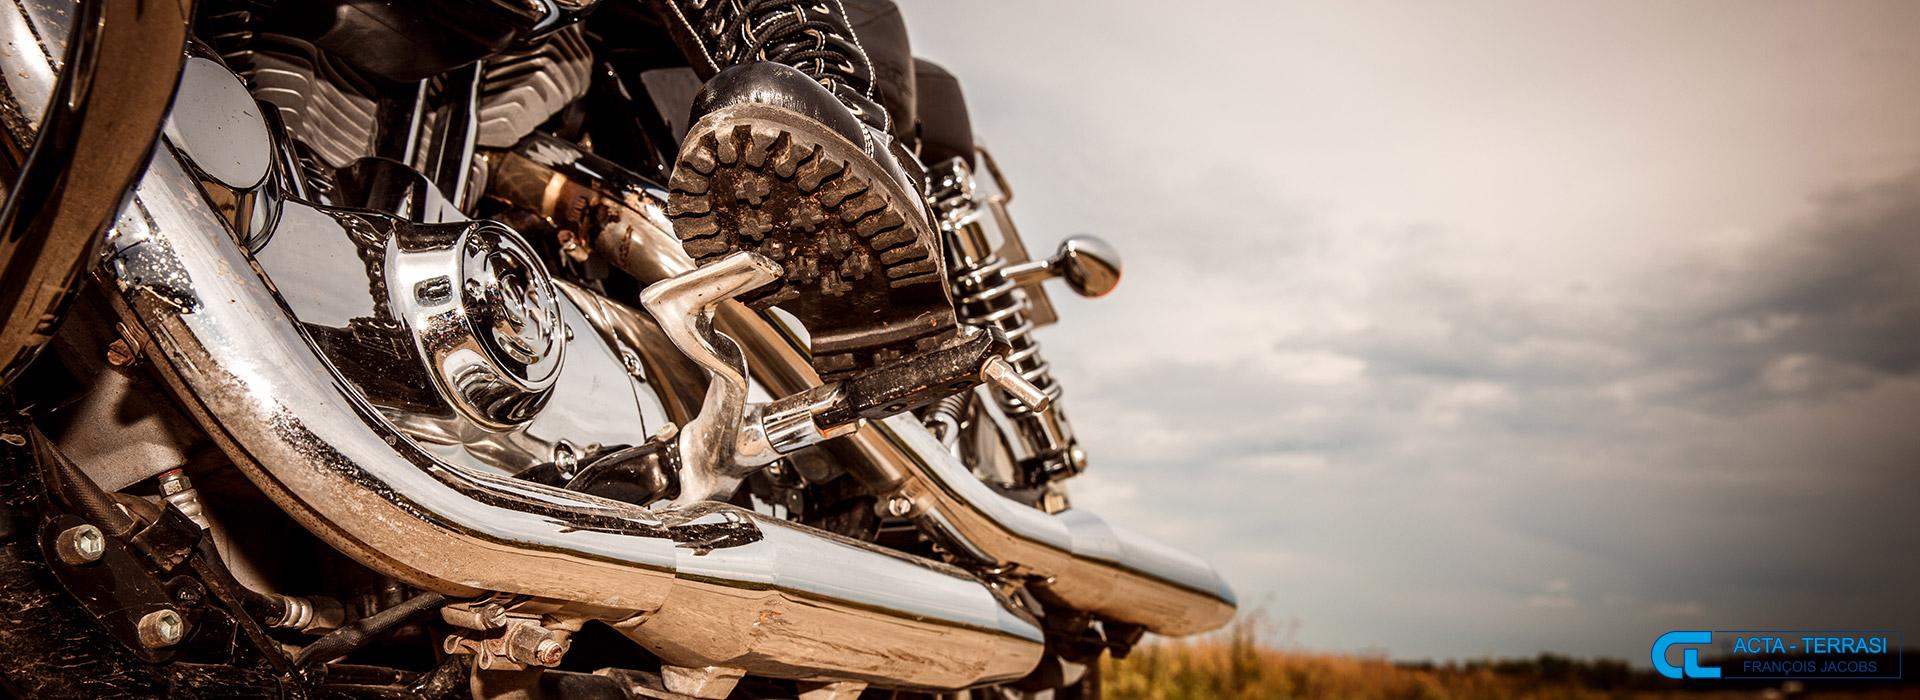 assurance moto la protection du motard au meilleur tarif. Black Bedroom Furniture Sets. Home Design Ideas